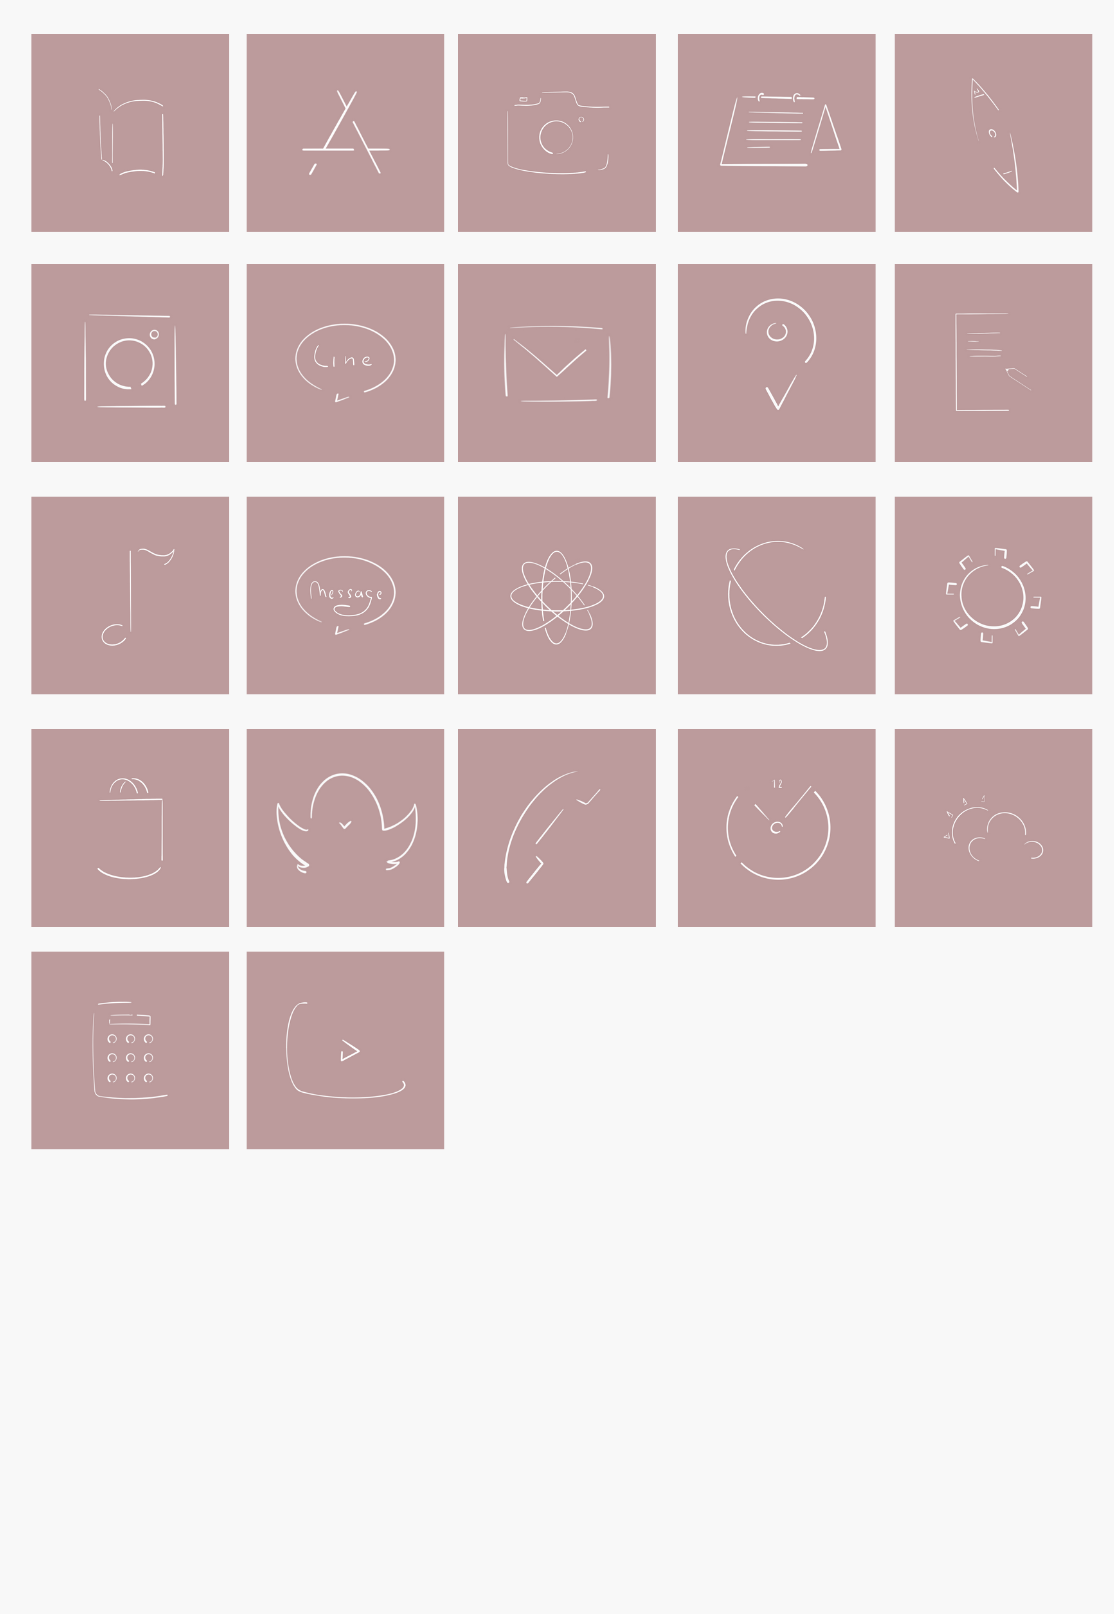 Ios14 Pink Line 2021 アイコン素材 アプリ Iphone アプリアイコン